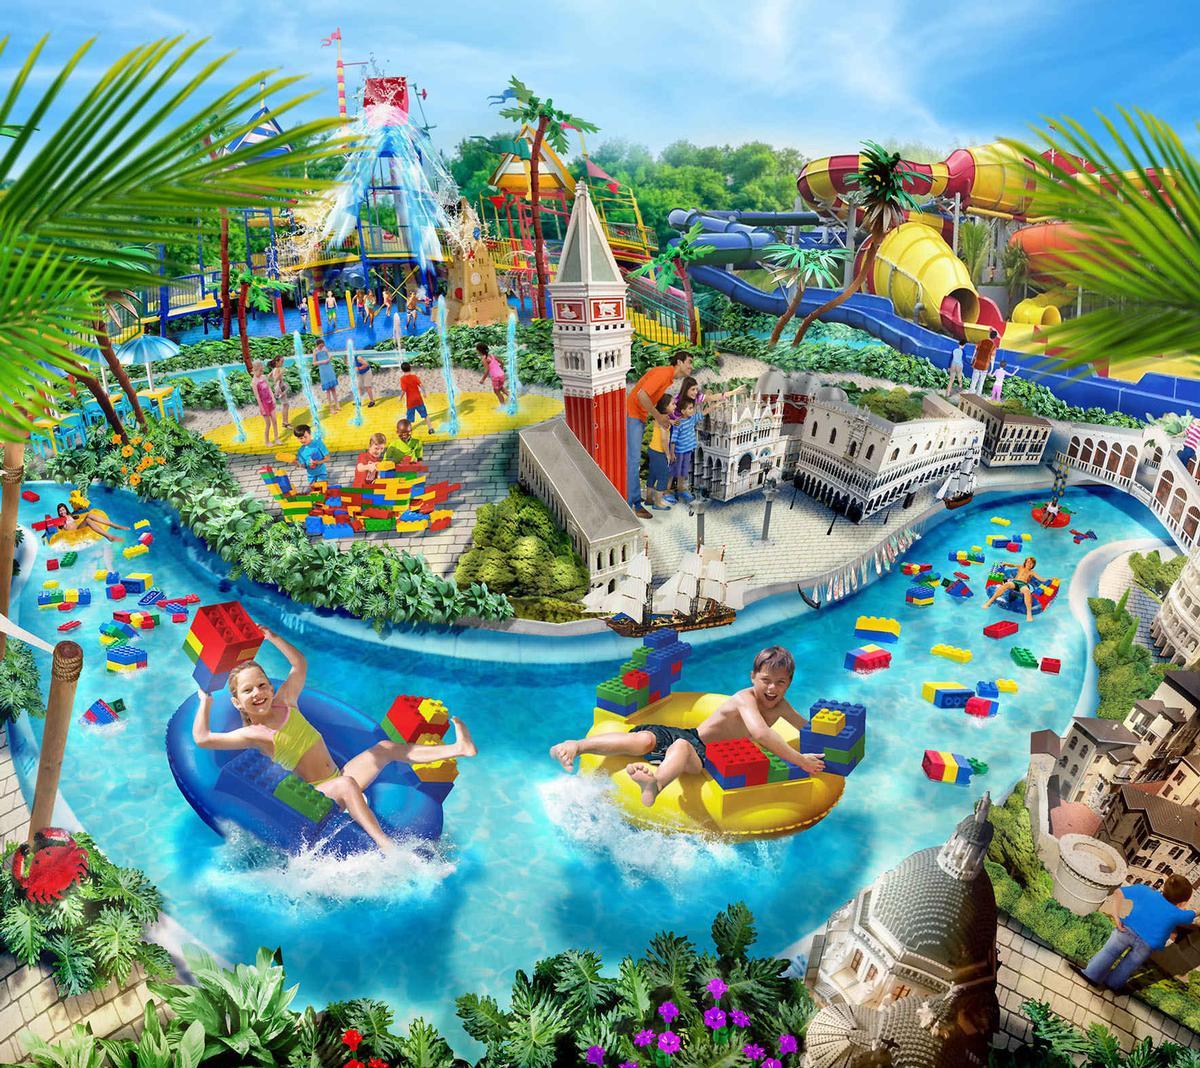 Legoland Water Park Gardaland will be the first Legoland Water Park to open in a non-Legoland destination